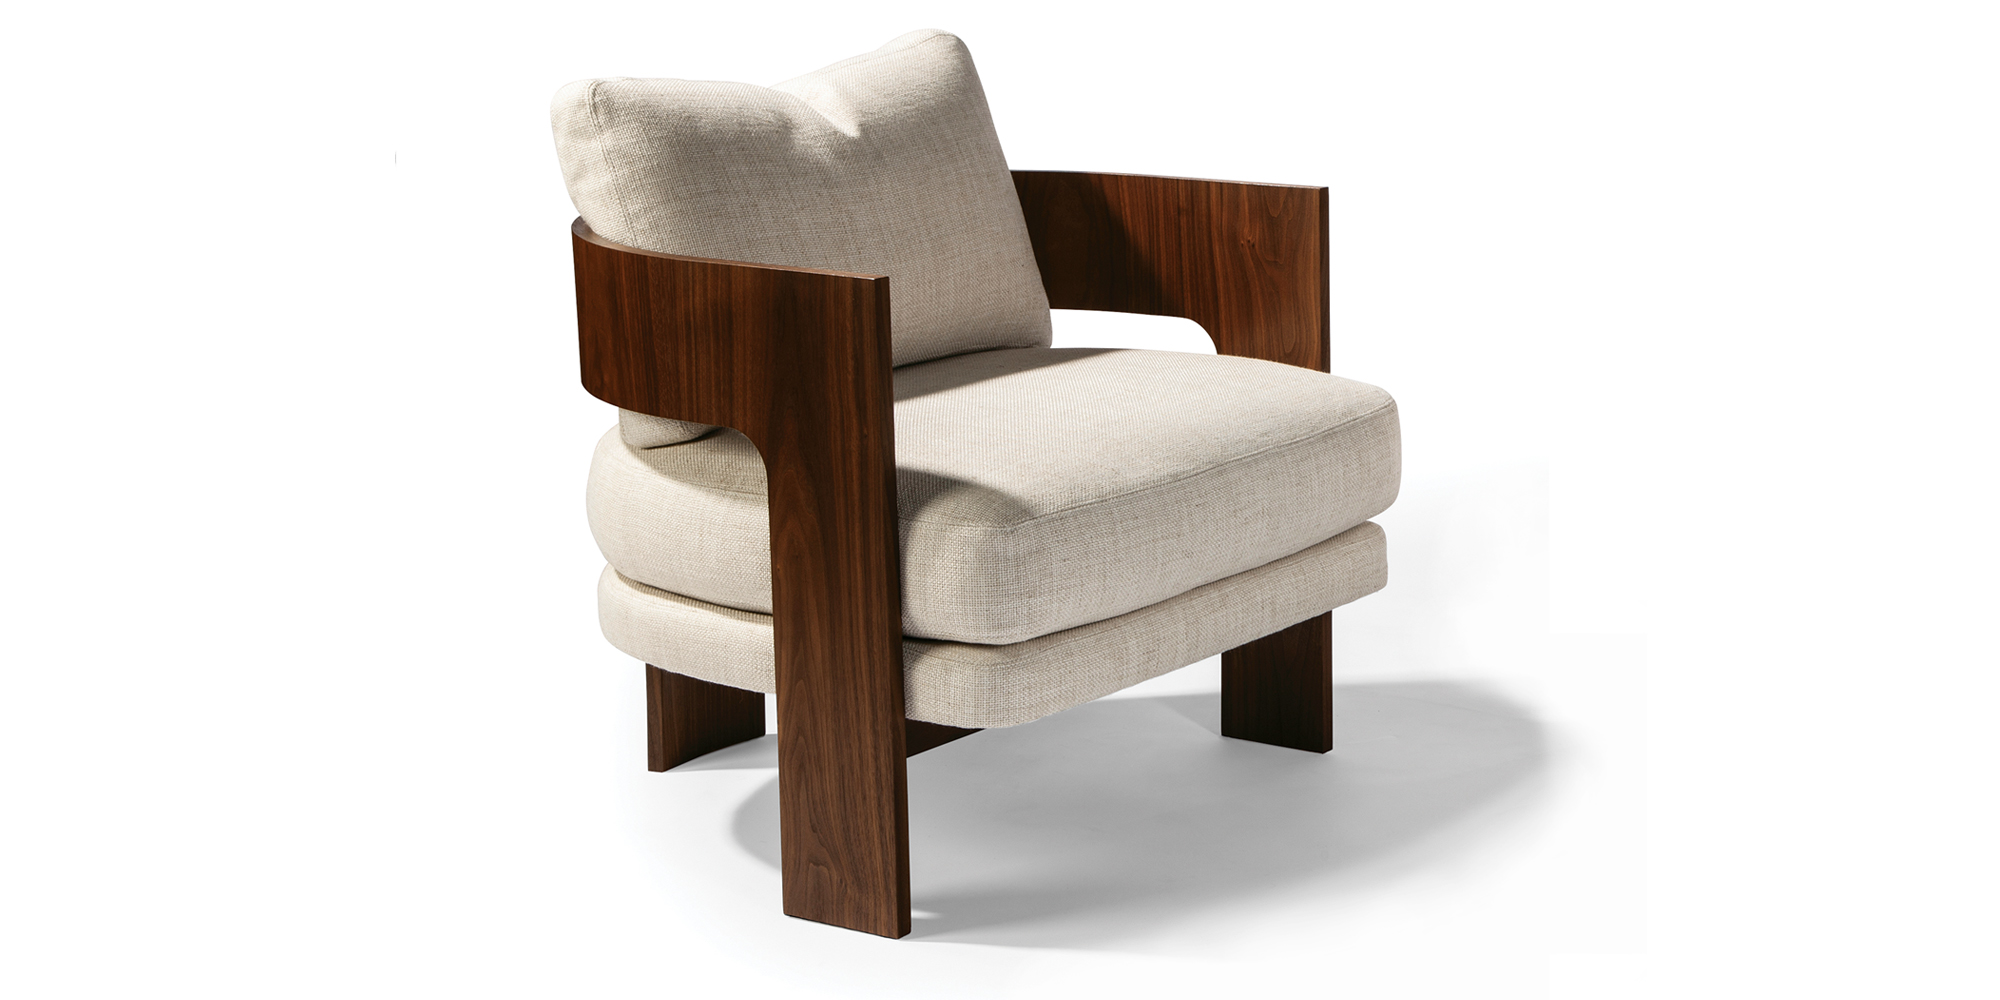 On 3 Lounge Chair (Walnut)